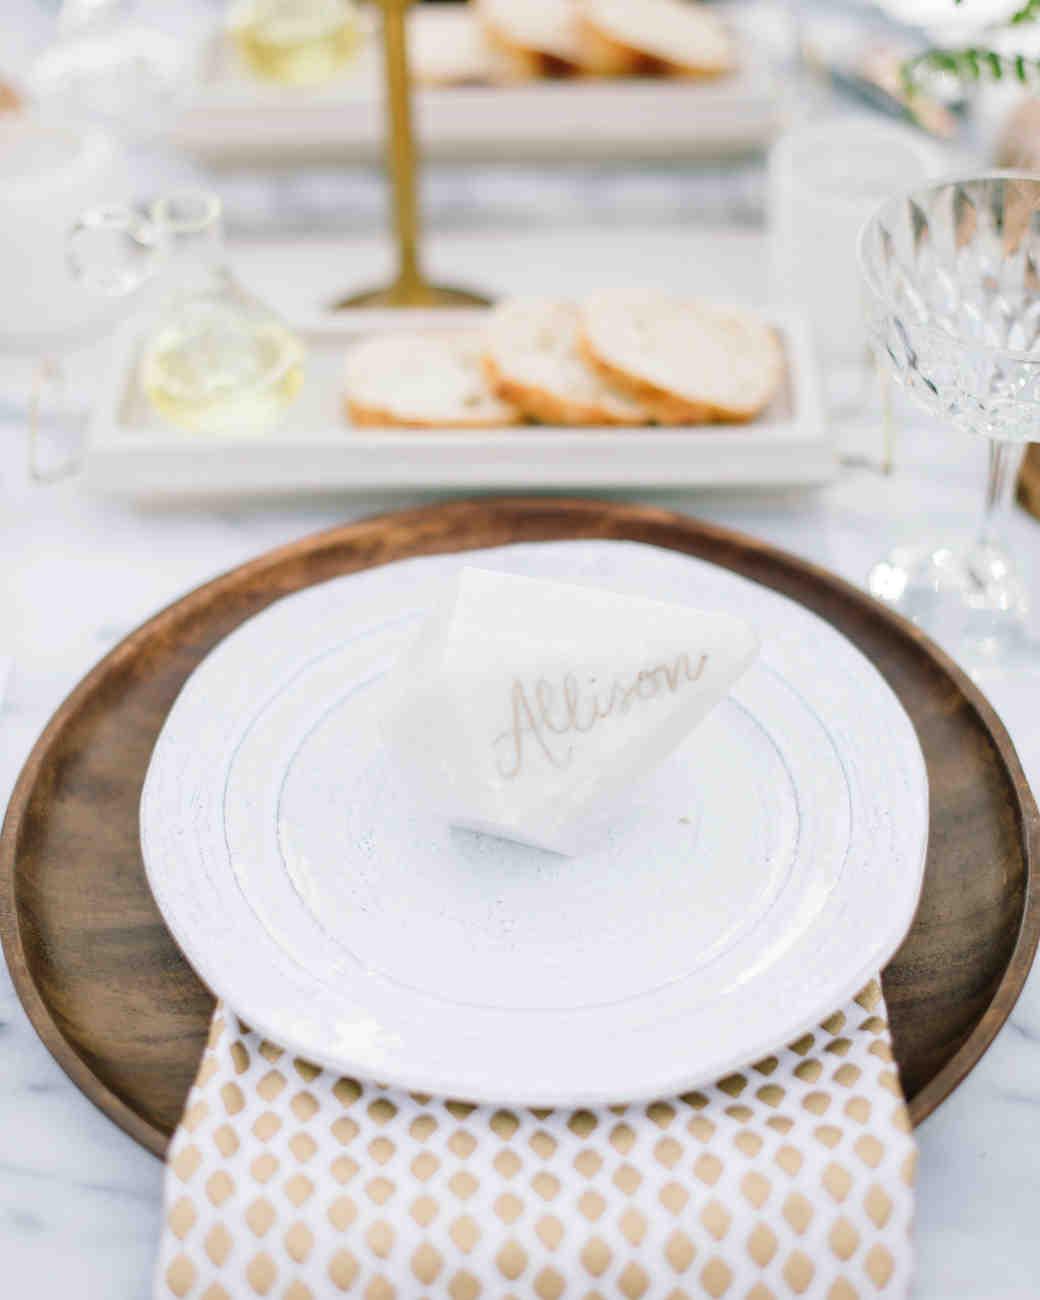 carlie-gabe-table-setting-reception-101dm1-4634-s111570-0515.jpg